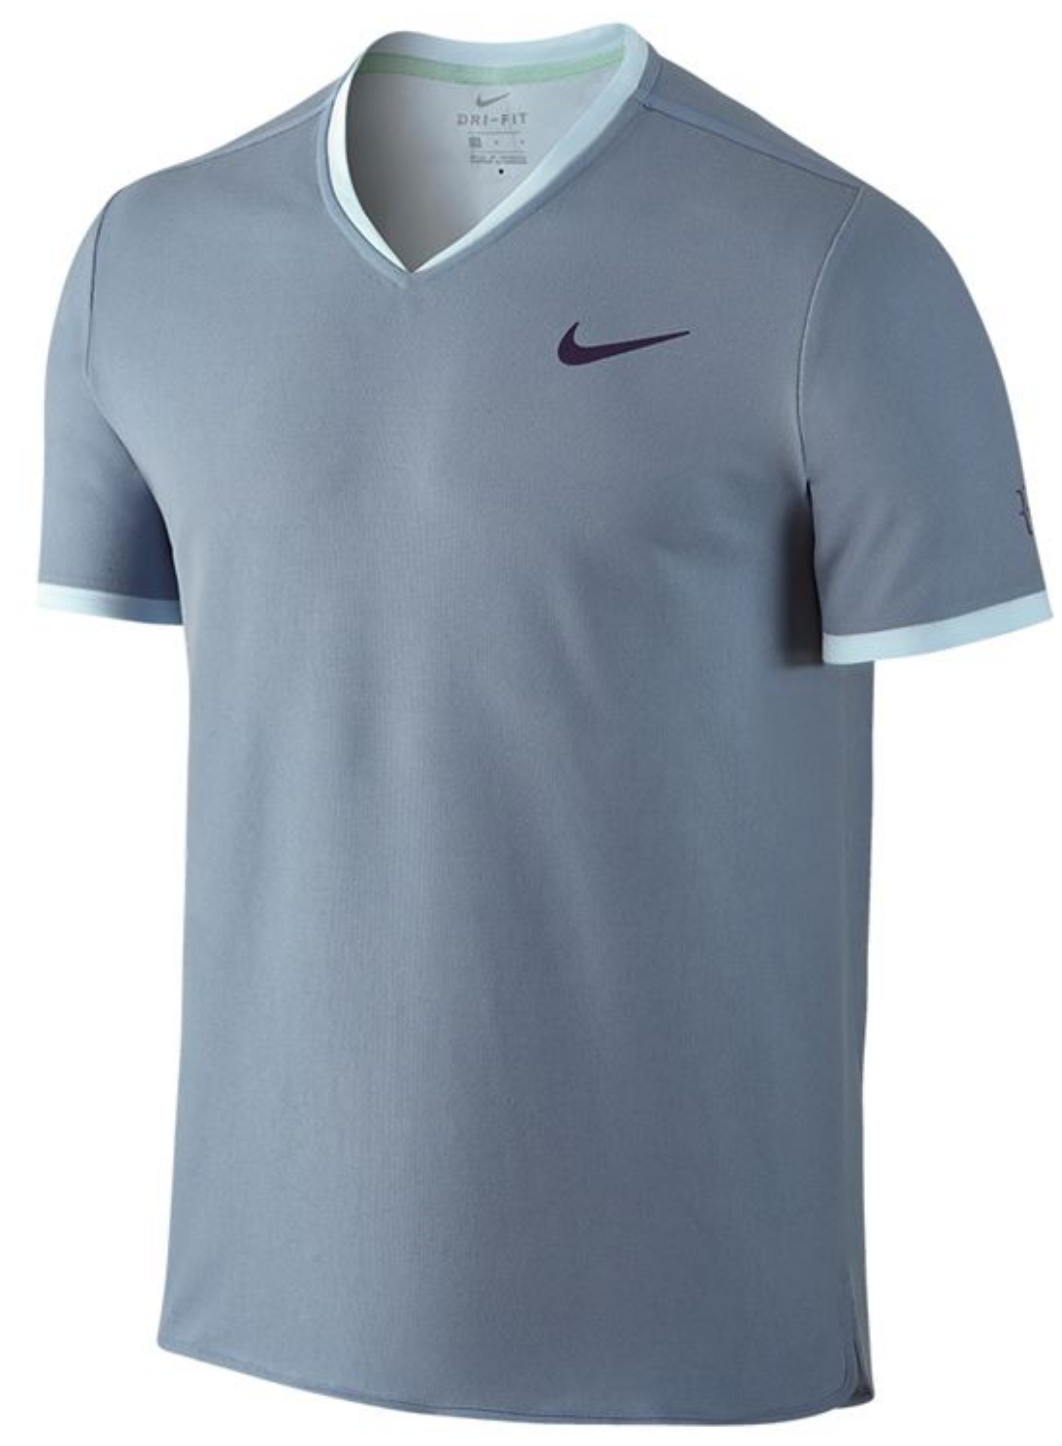 Roger Federer 2017 Hopman Cup Shirt 2